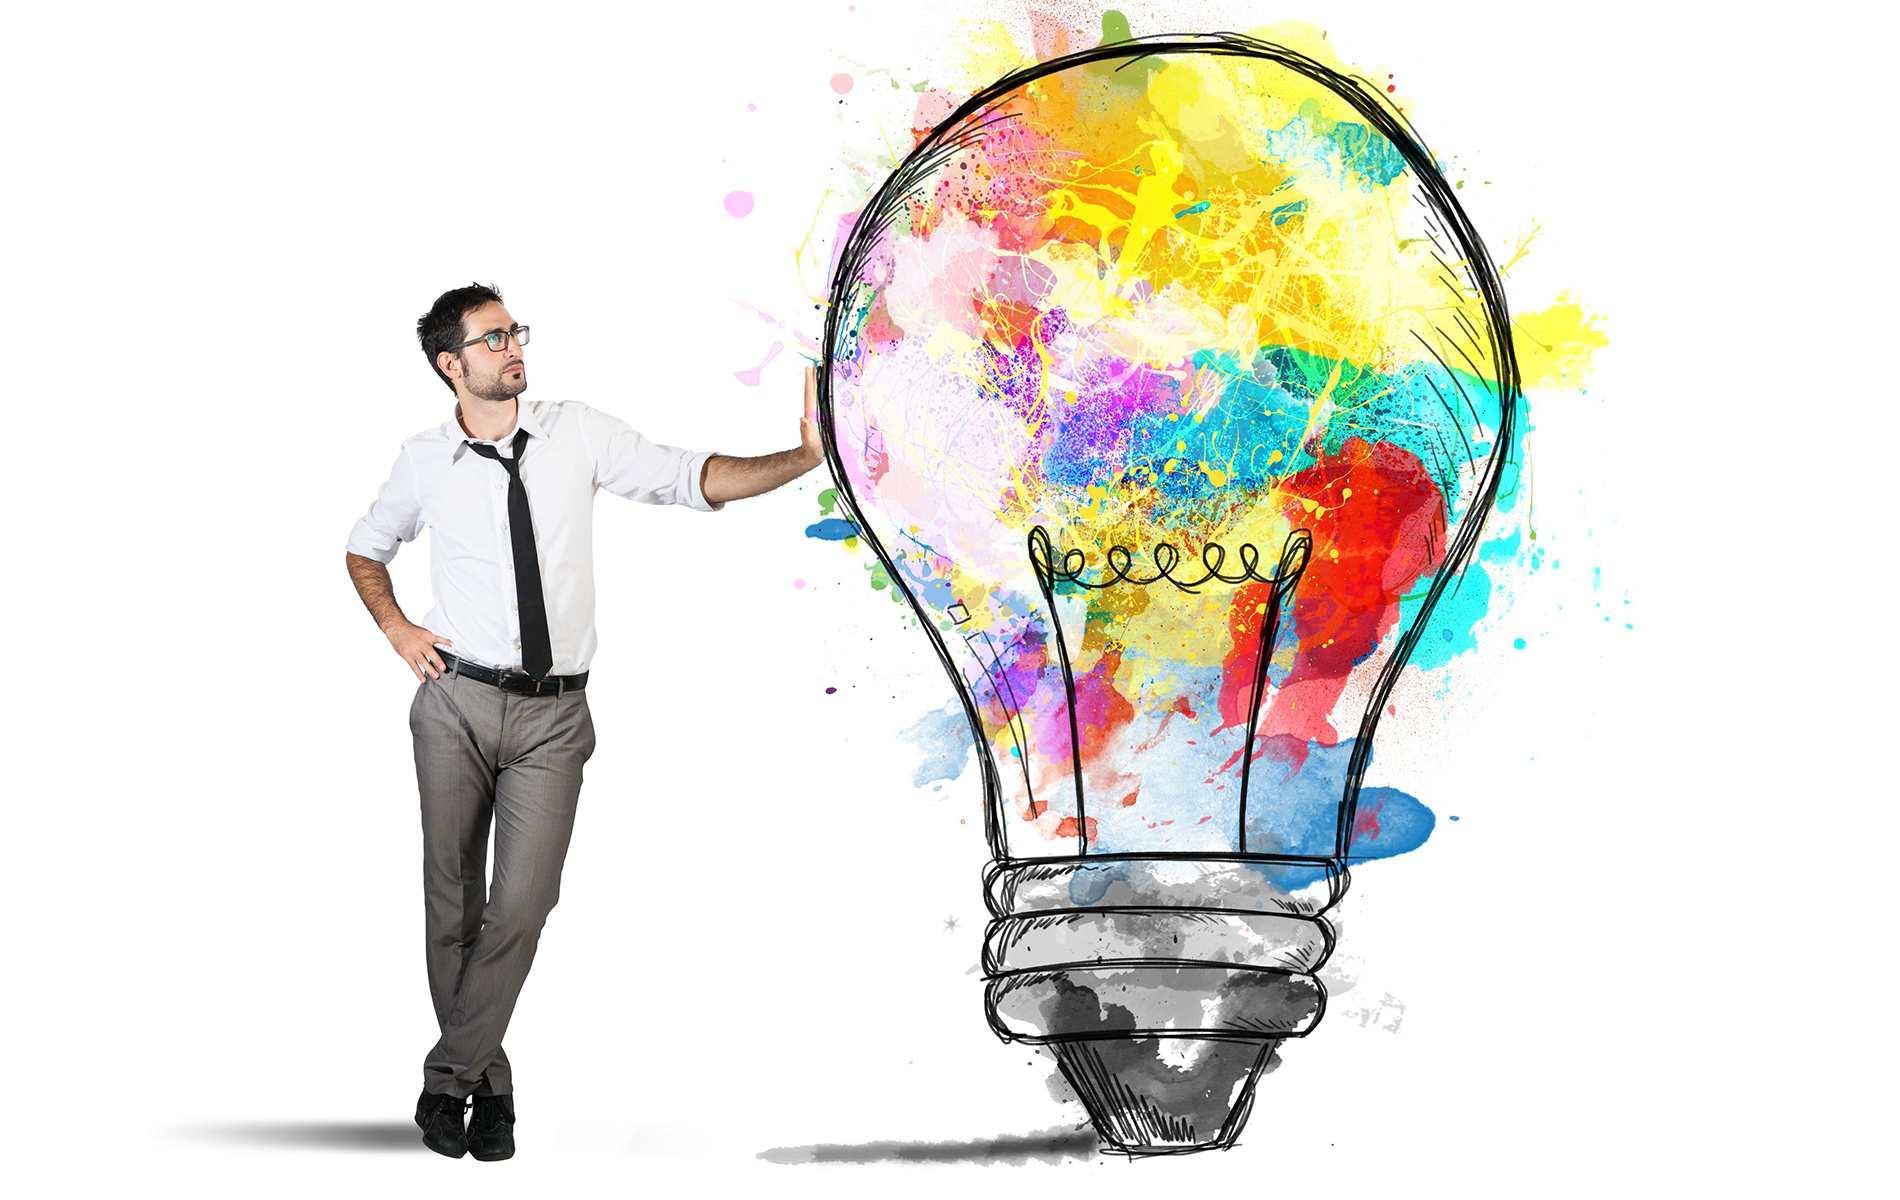 concept-for-a-business-idea